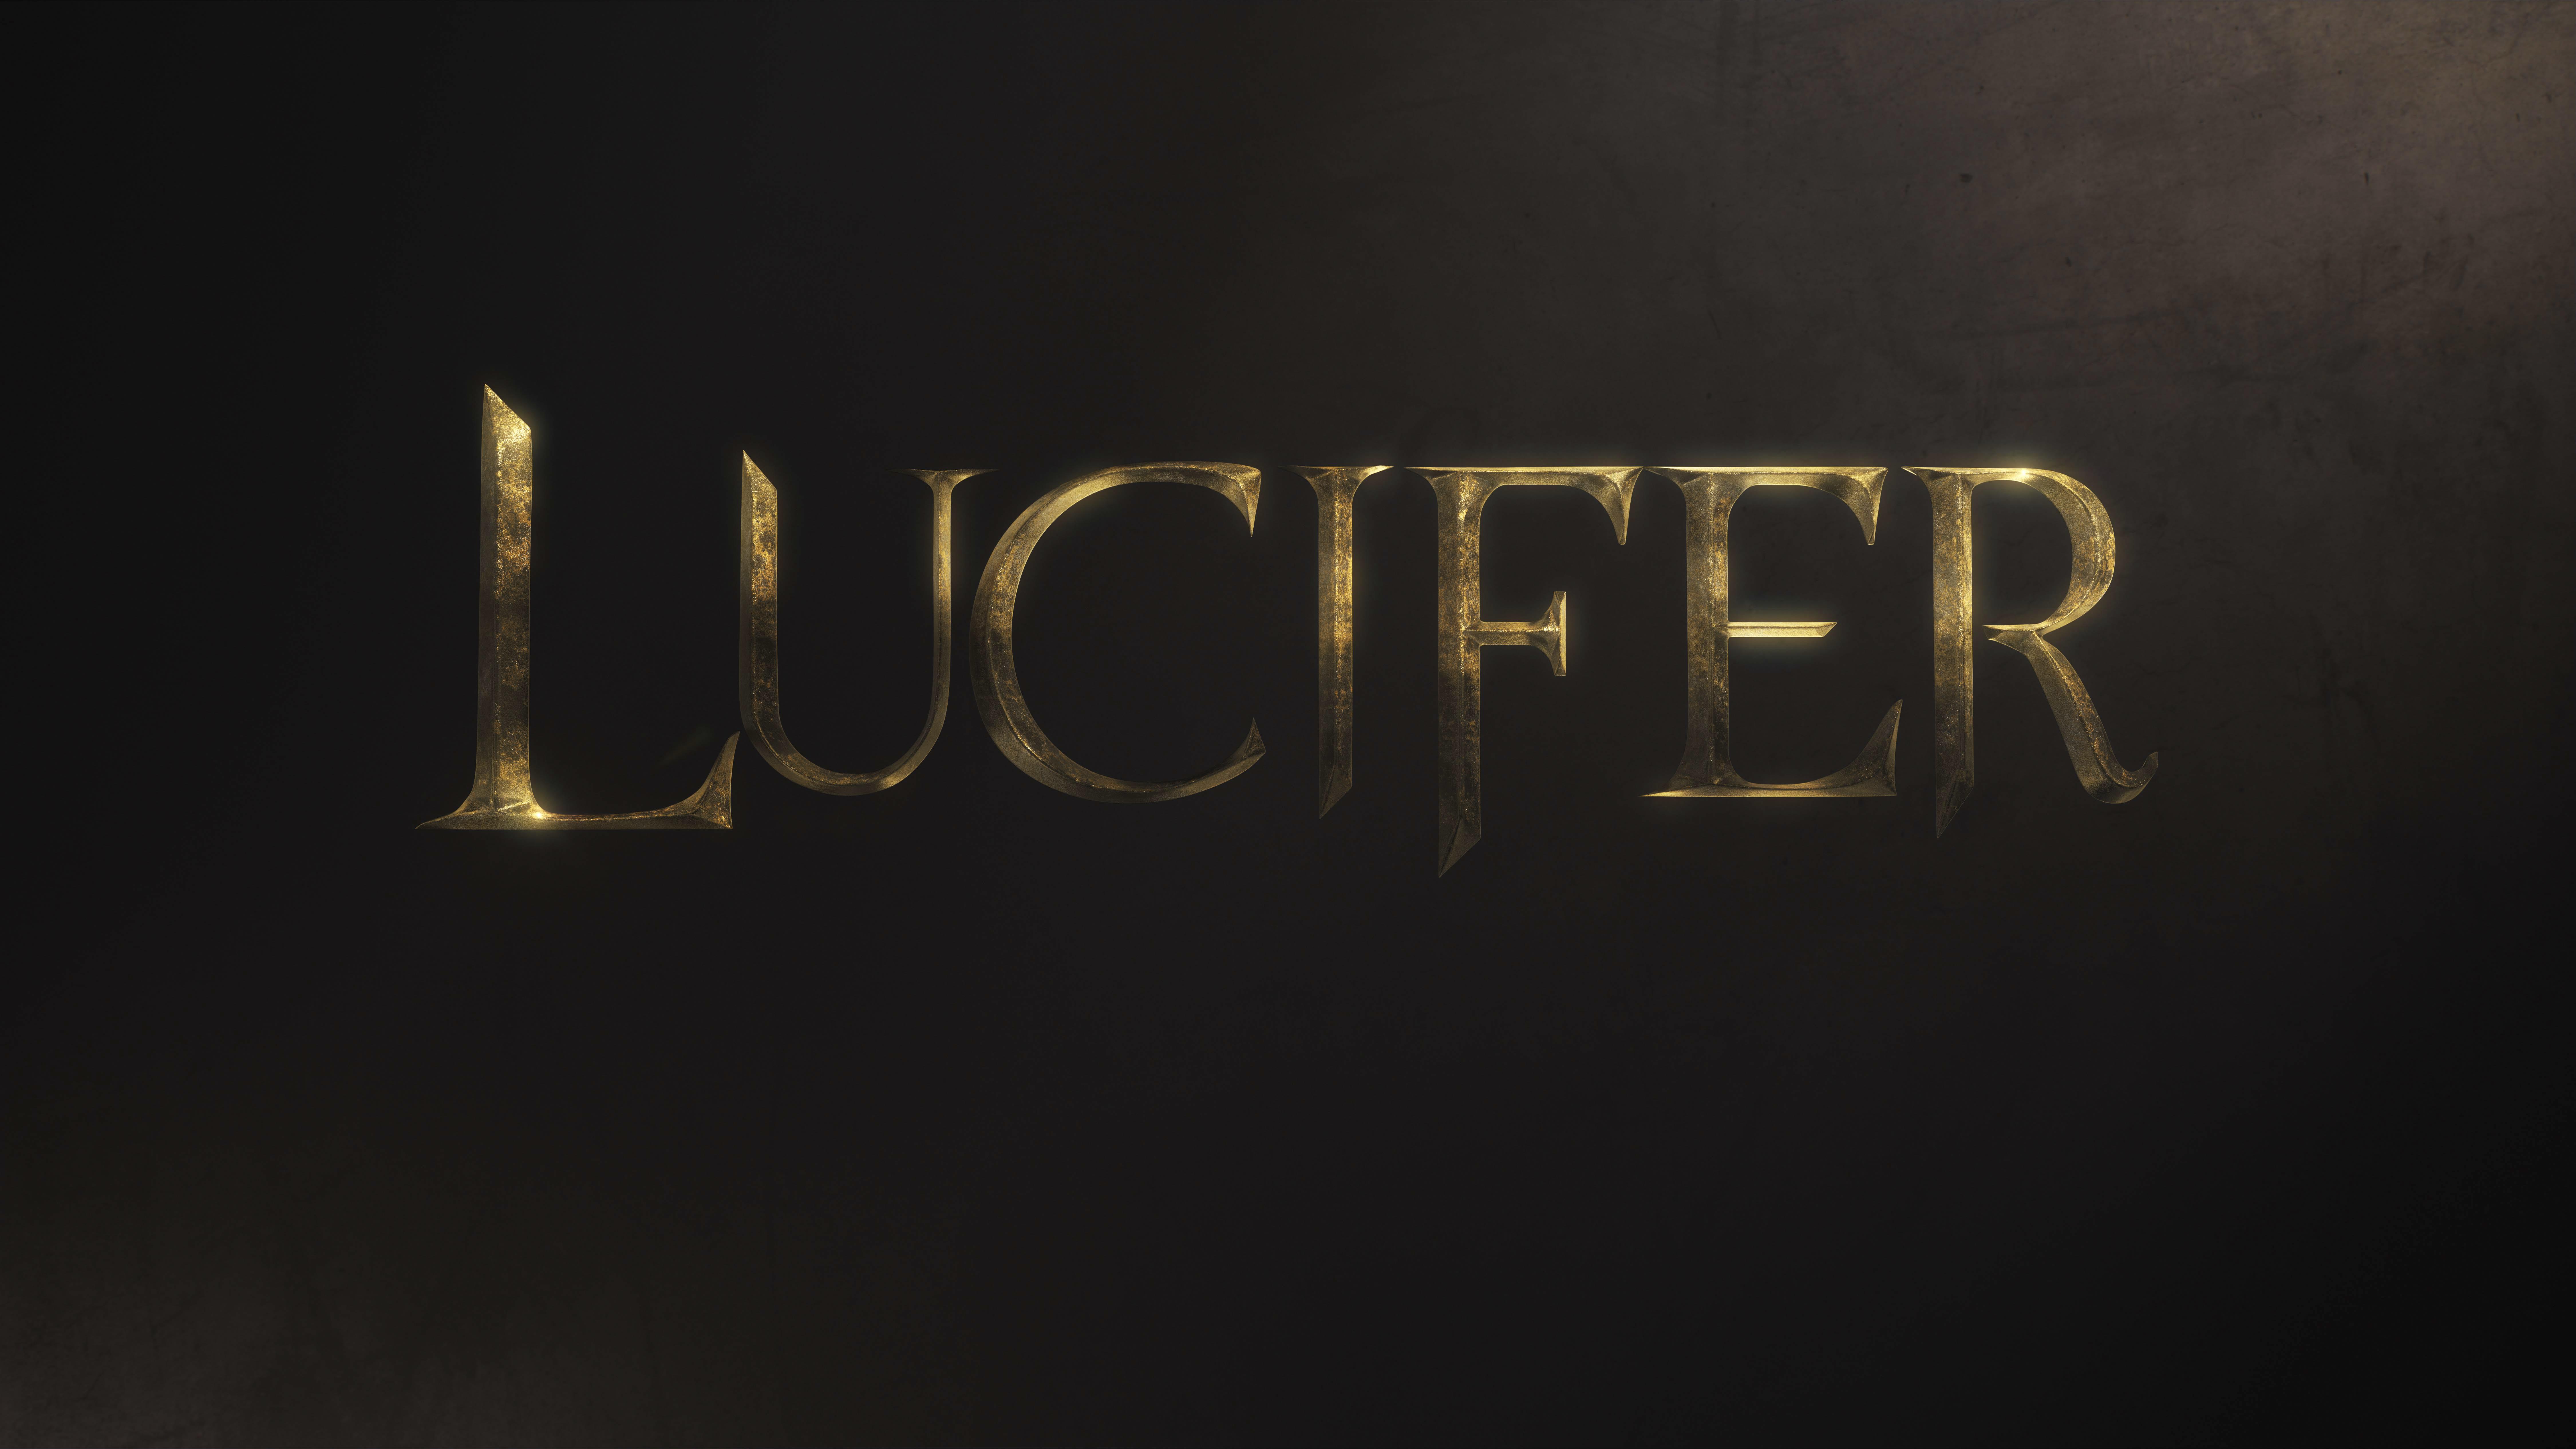 Lucifer Wallpaper 4k: Lucifer Series Wallpapers High Quality